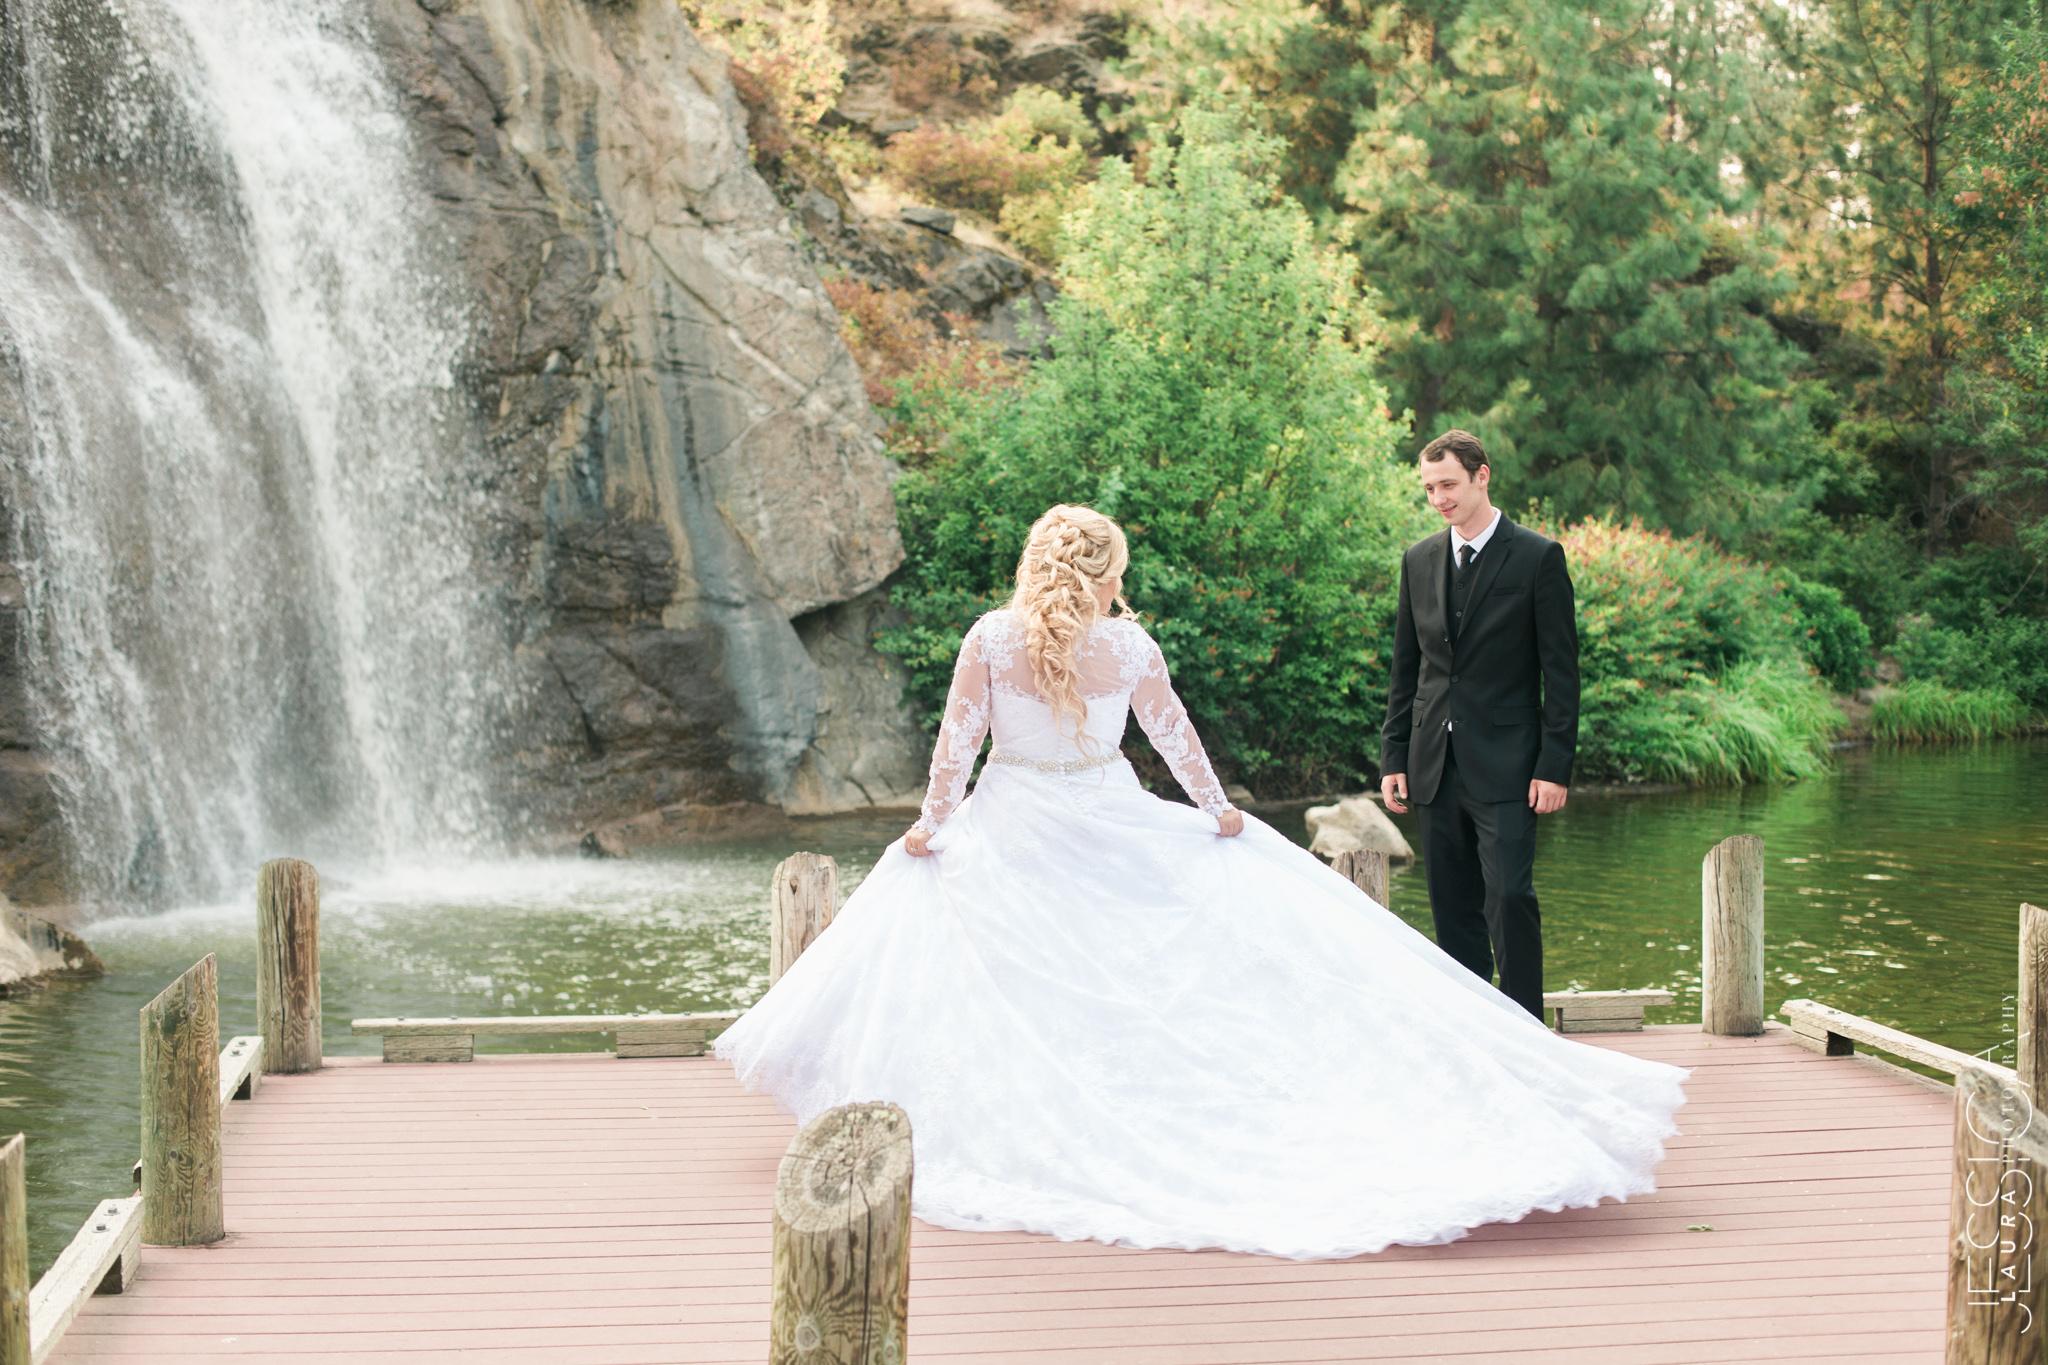 Eugene-Maryana_wedding_08062017_web (544 of 558).JPG